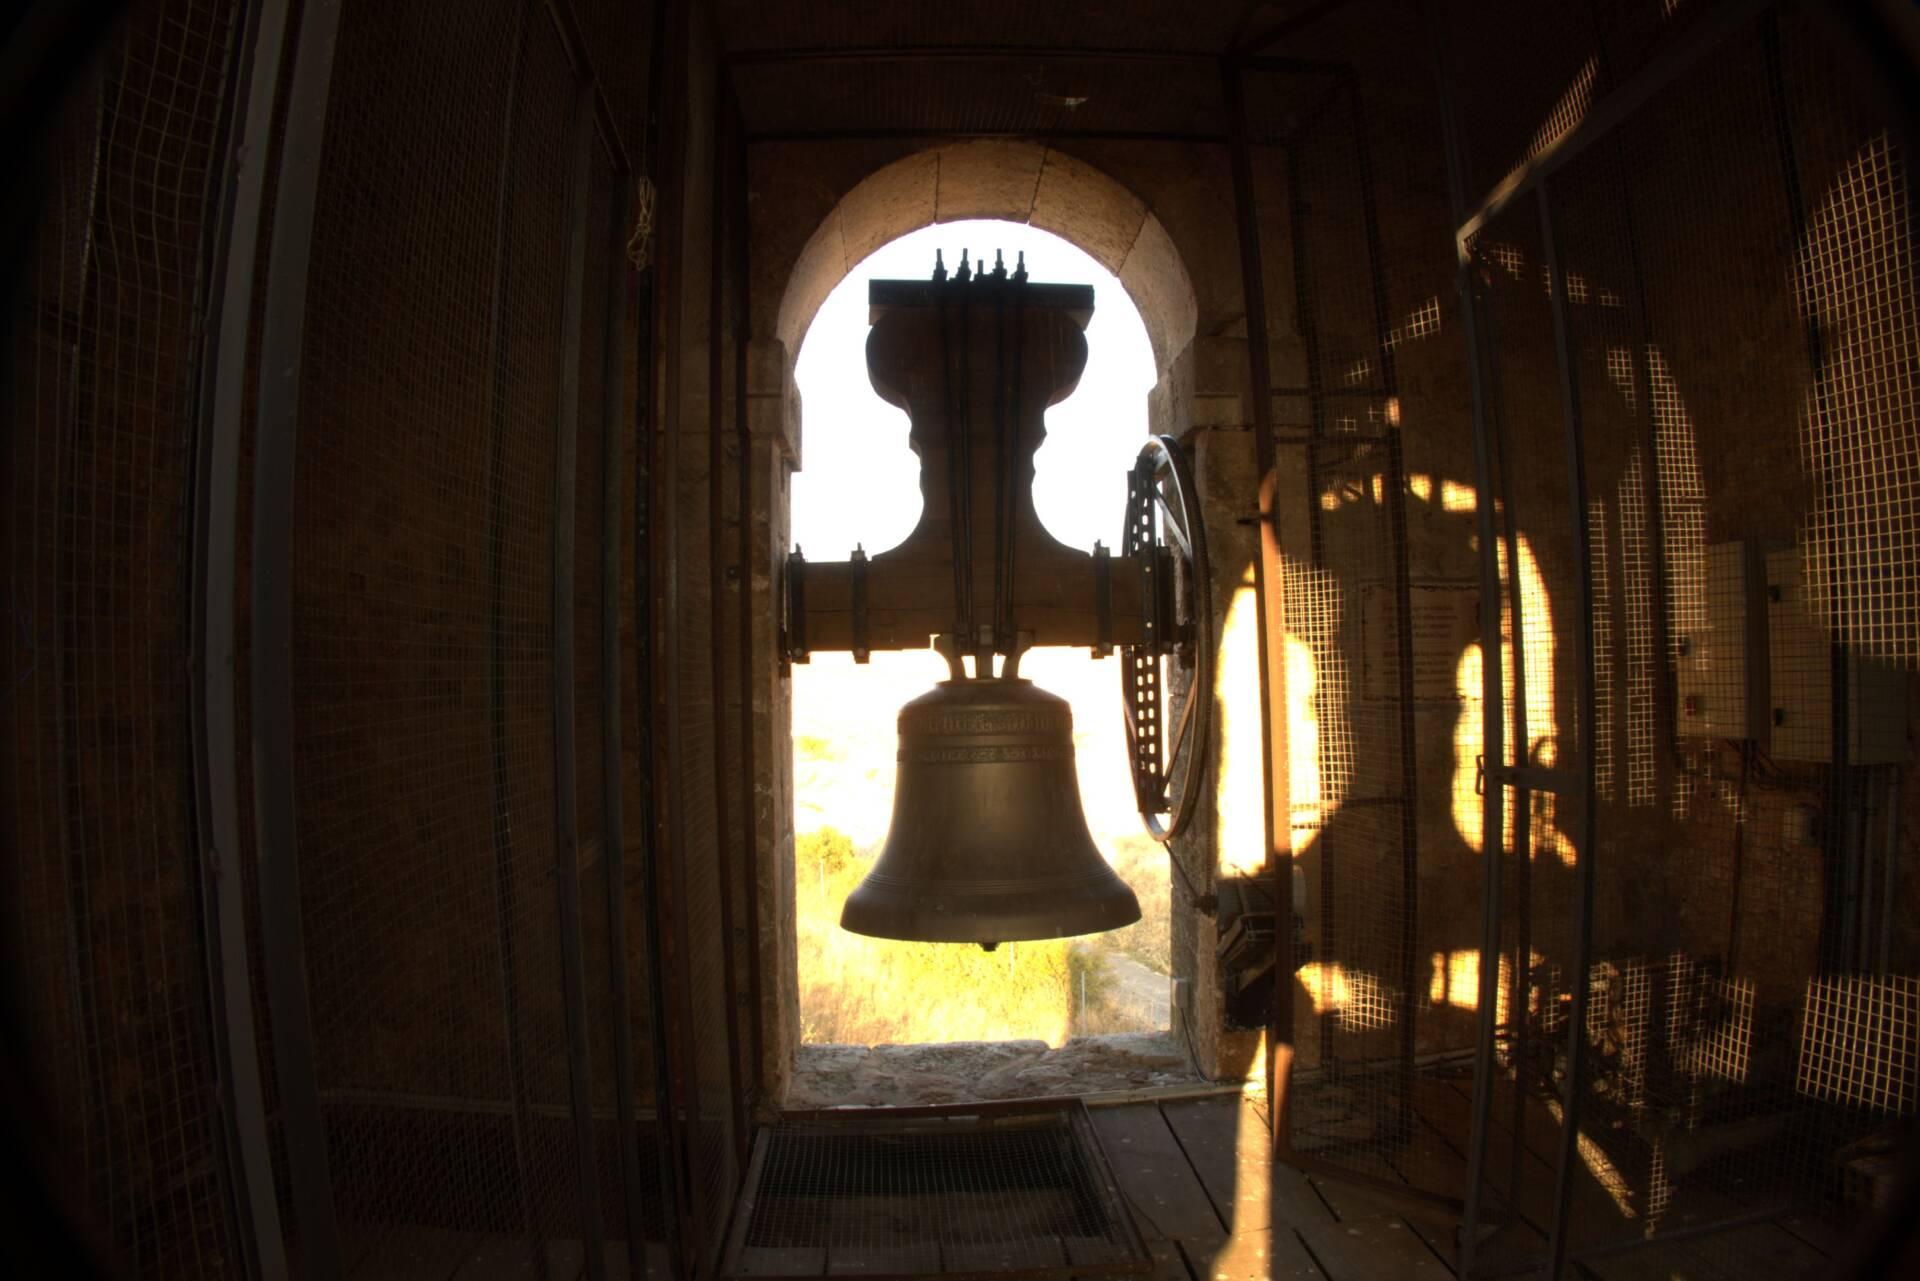 campaneros sonido tradición mecerreyes automatización